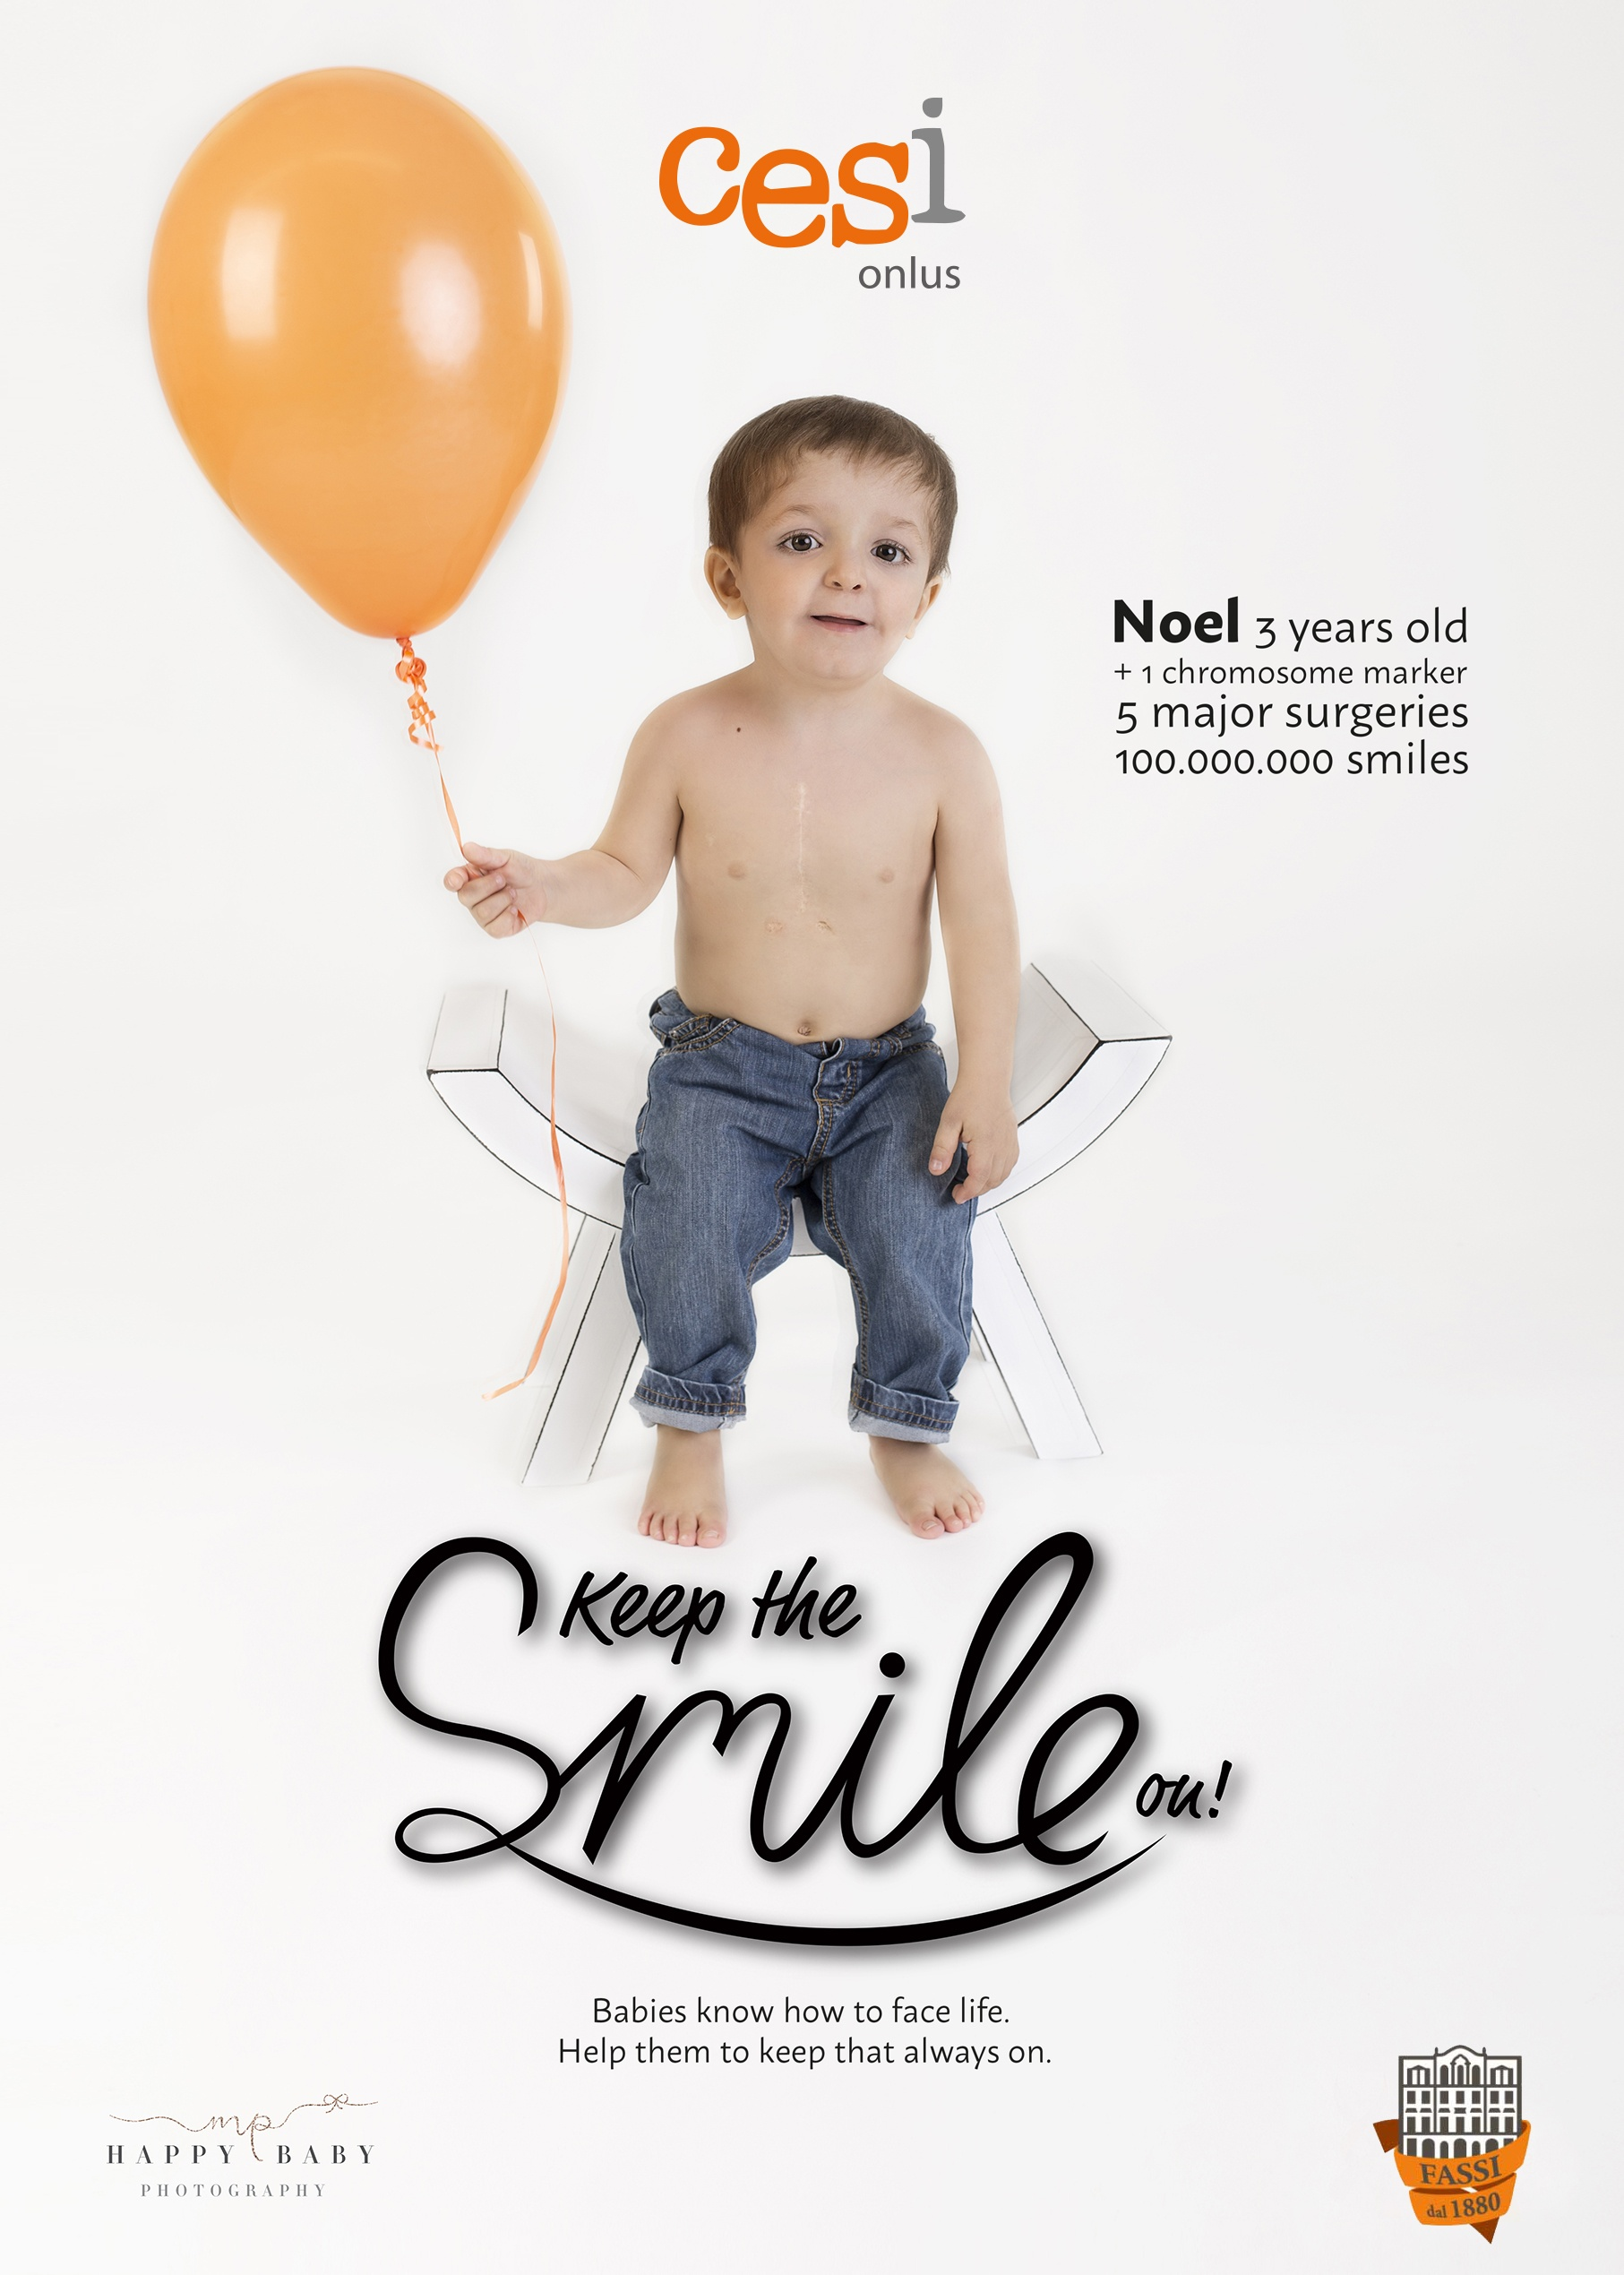 Keep the smile on!